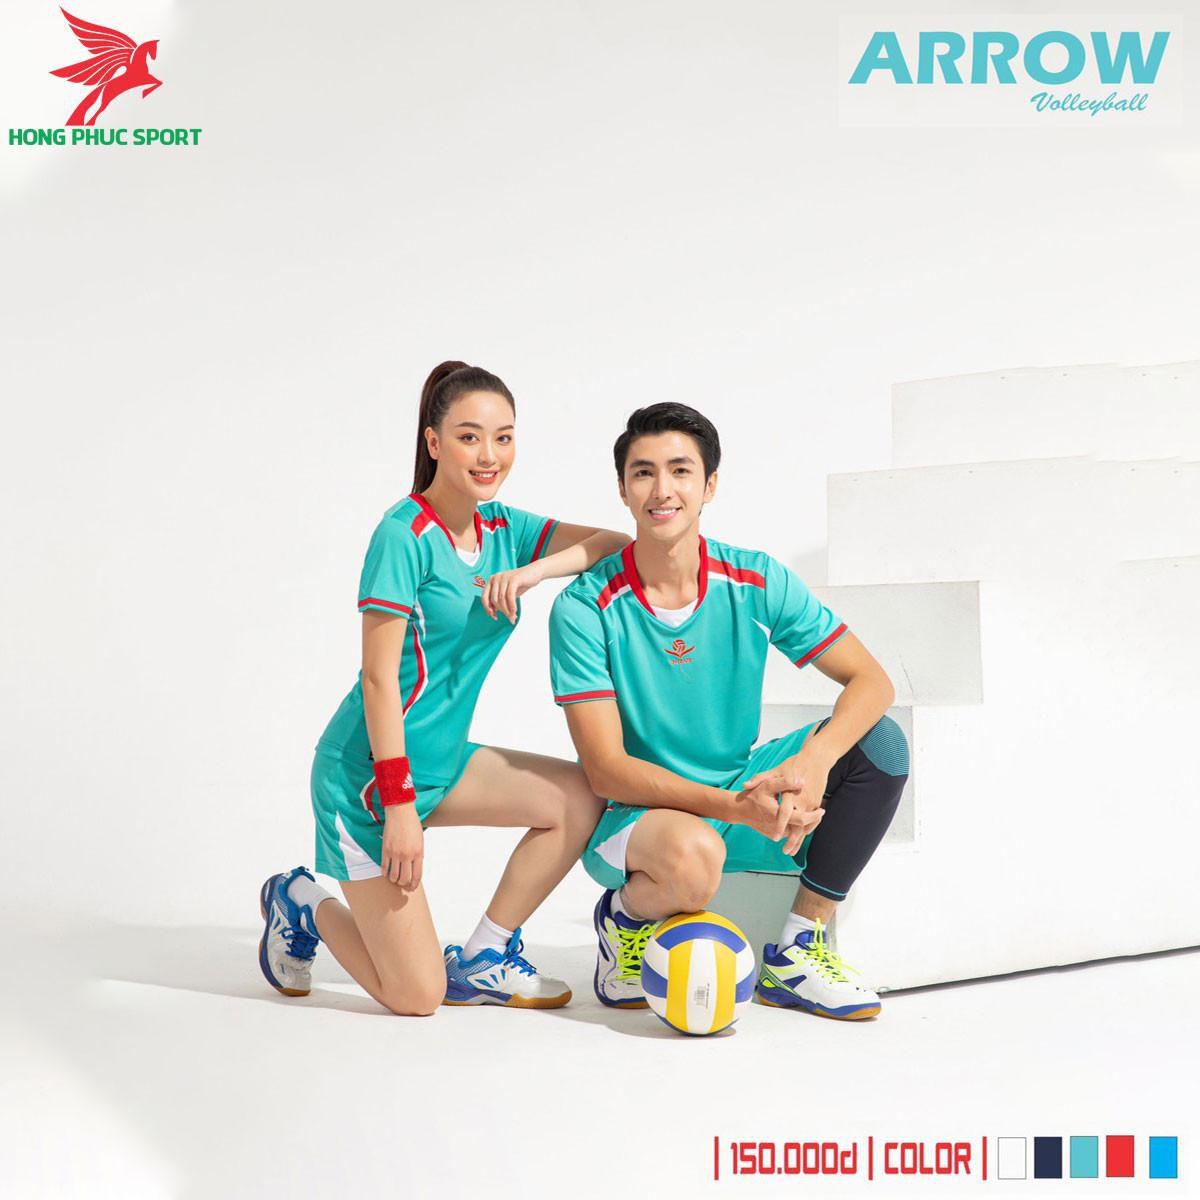 https://cdn.hongphucsport.com/unsafe/s4.shopbay.vn/files/285/ao-bong-chuyen-overate-arrow-mau-xanh-ngoc-2-605175e734a62.jpg